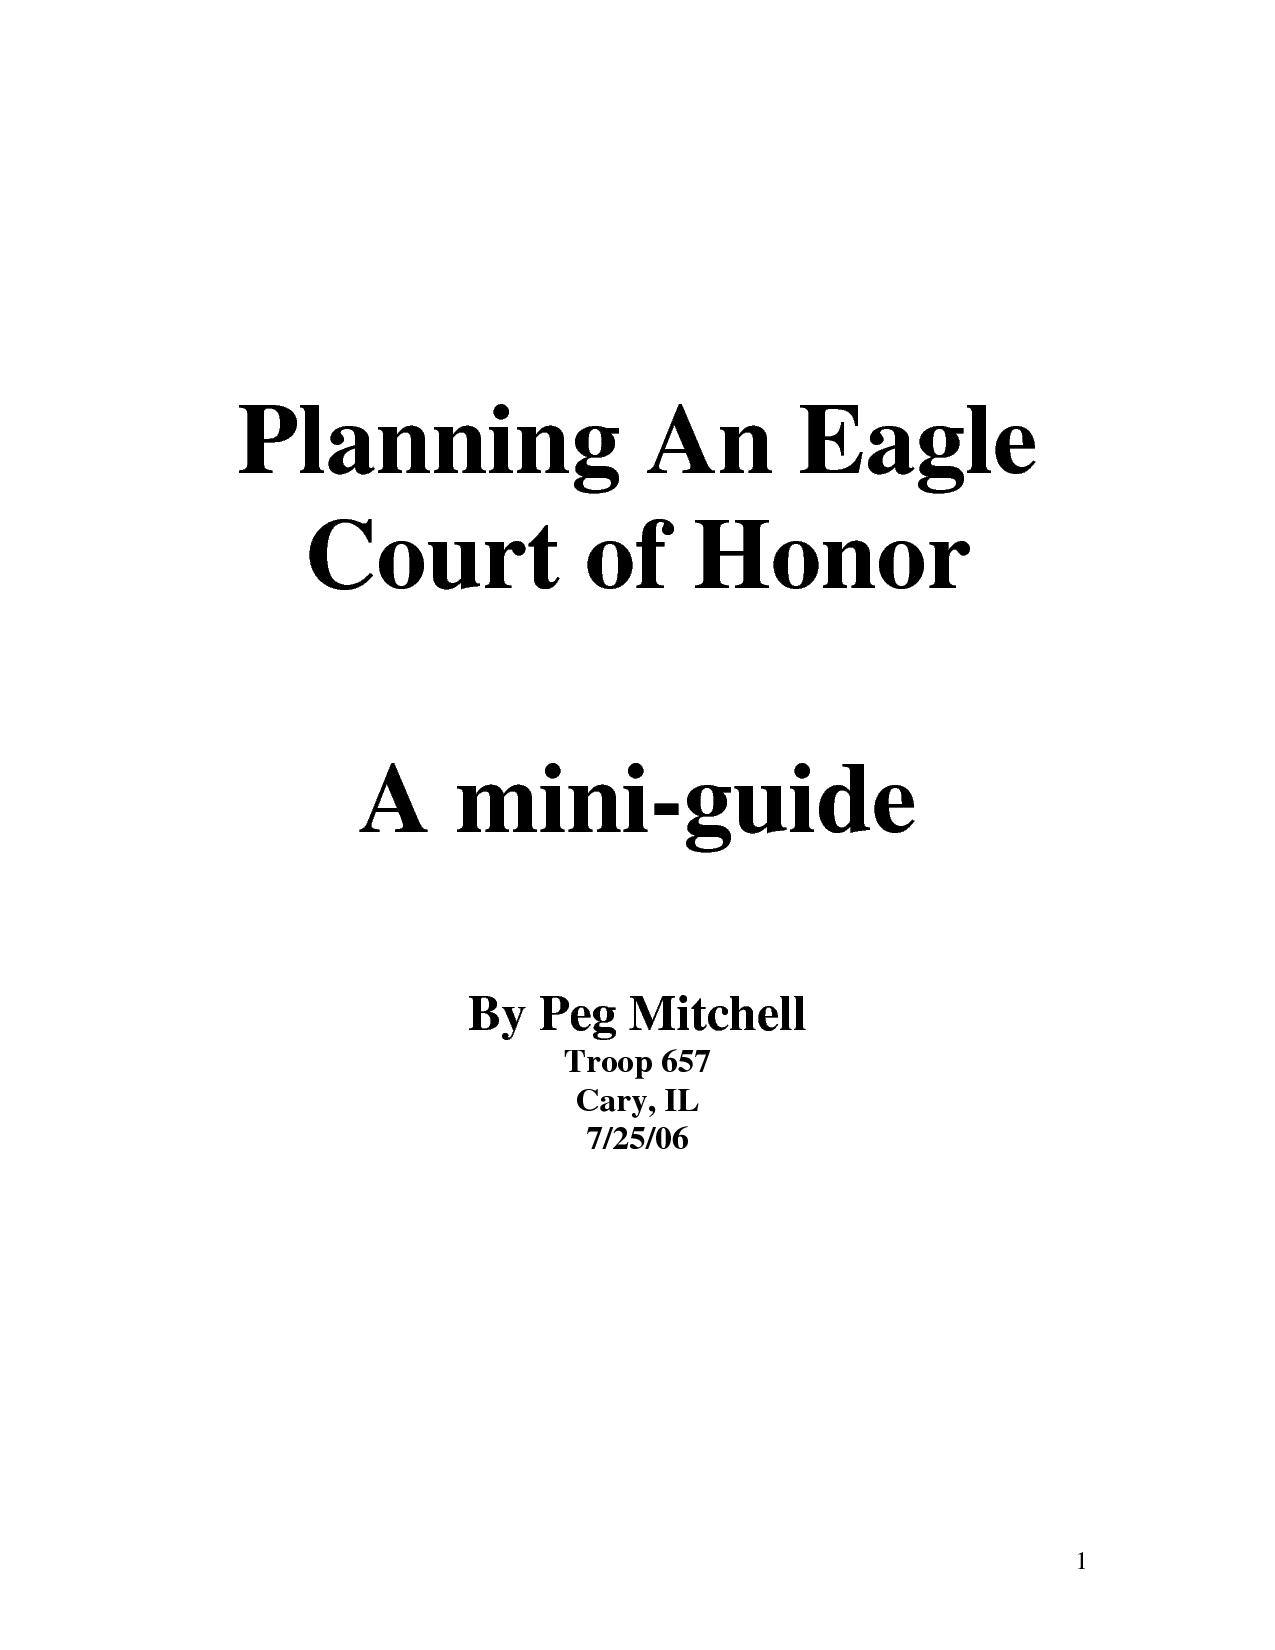 Eagle Scout Announcements Invitations